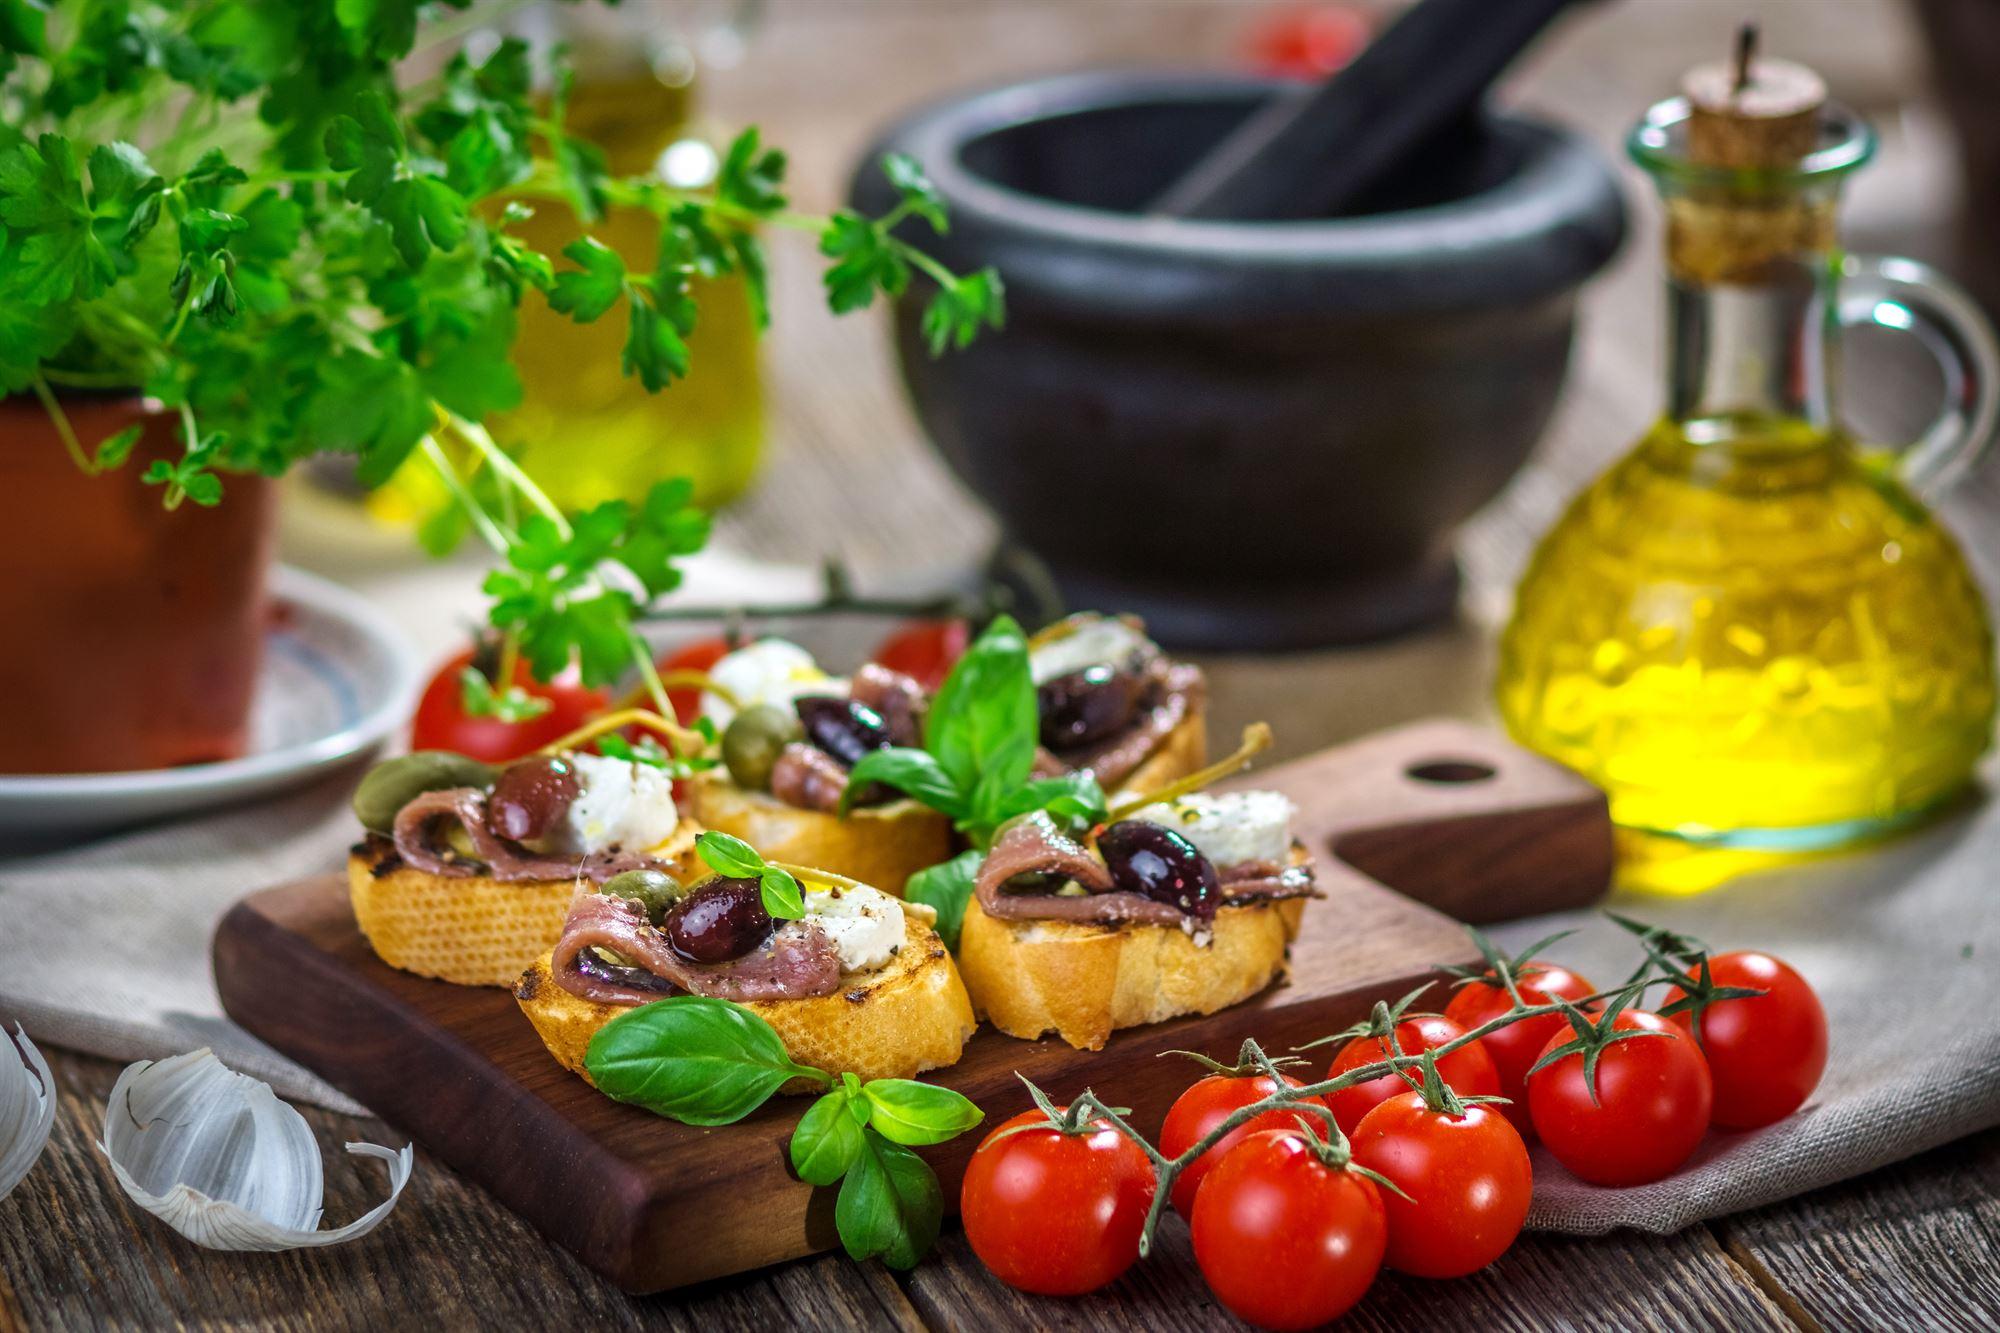 Ristet brød med ansjosfilet, peberfrugt og aubergine